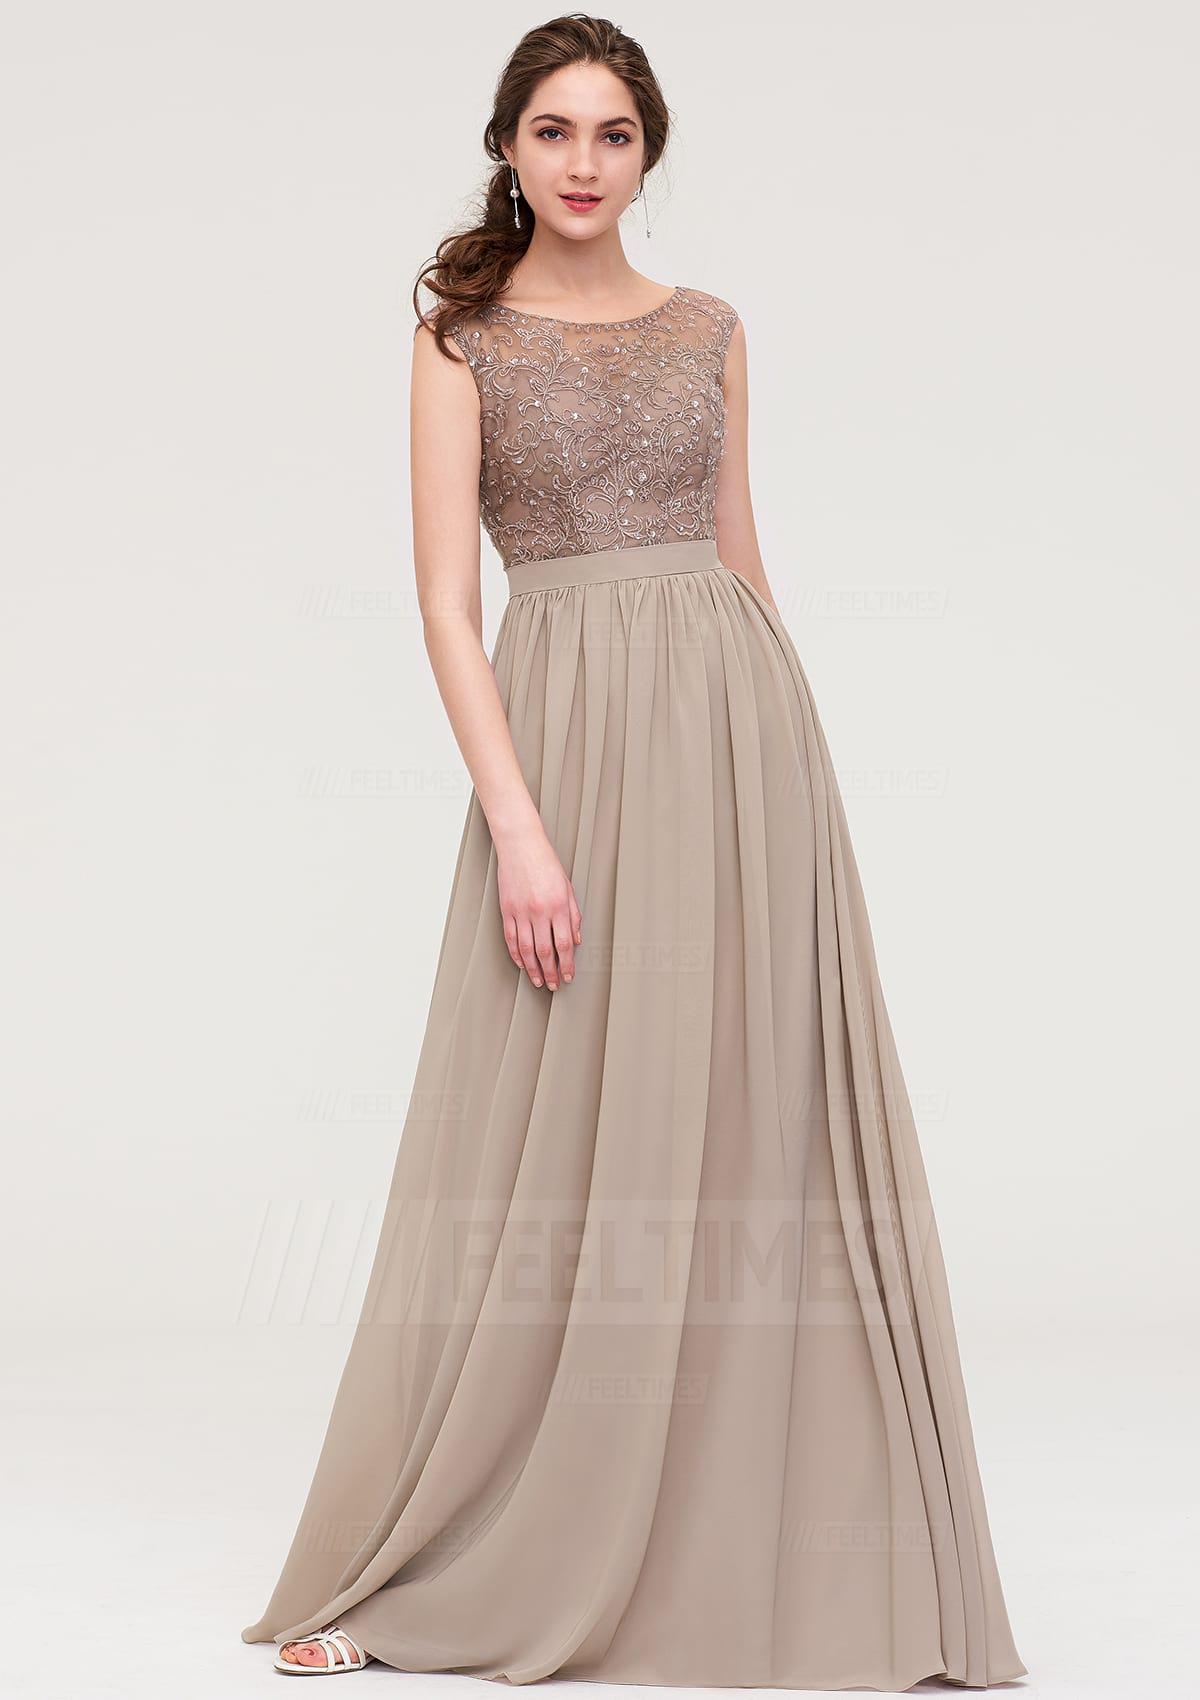 Bridesmaid Dresses and Separates